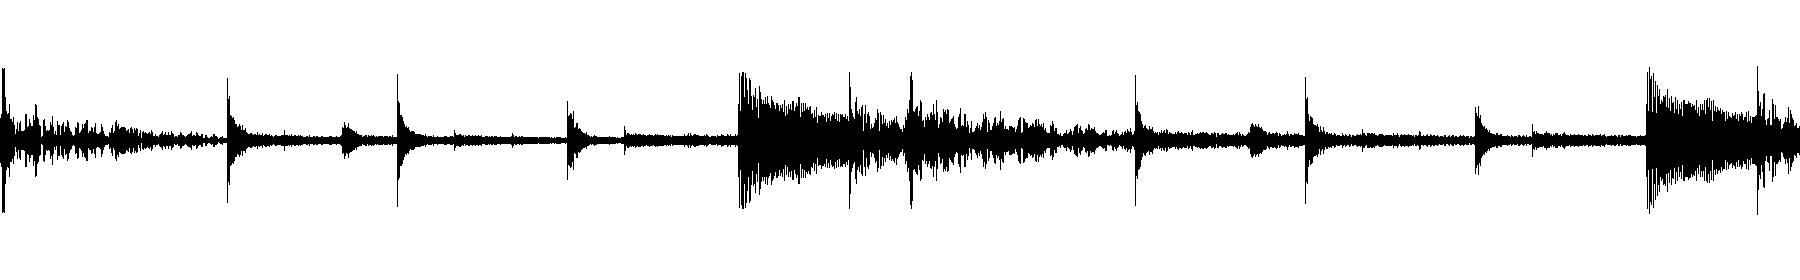 blbc jazzydrums 110 02